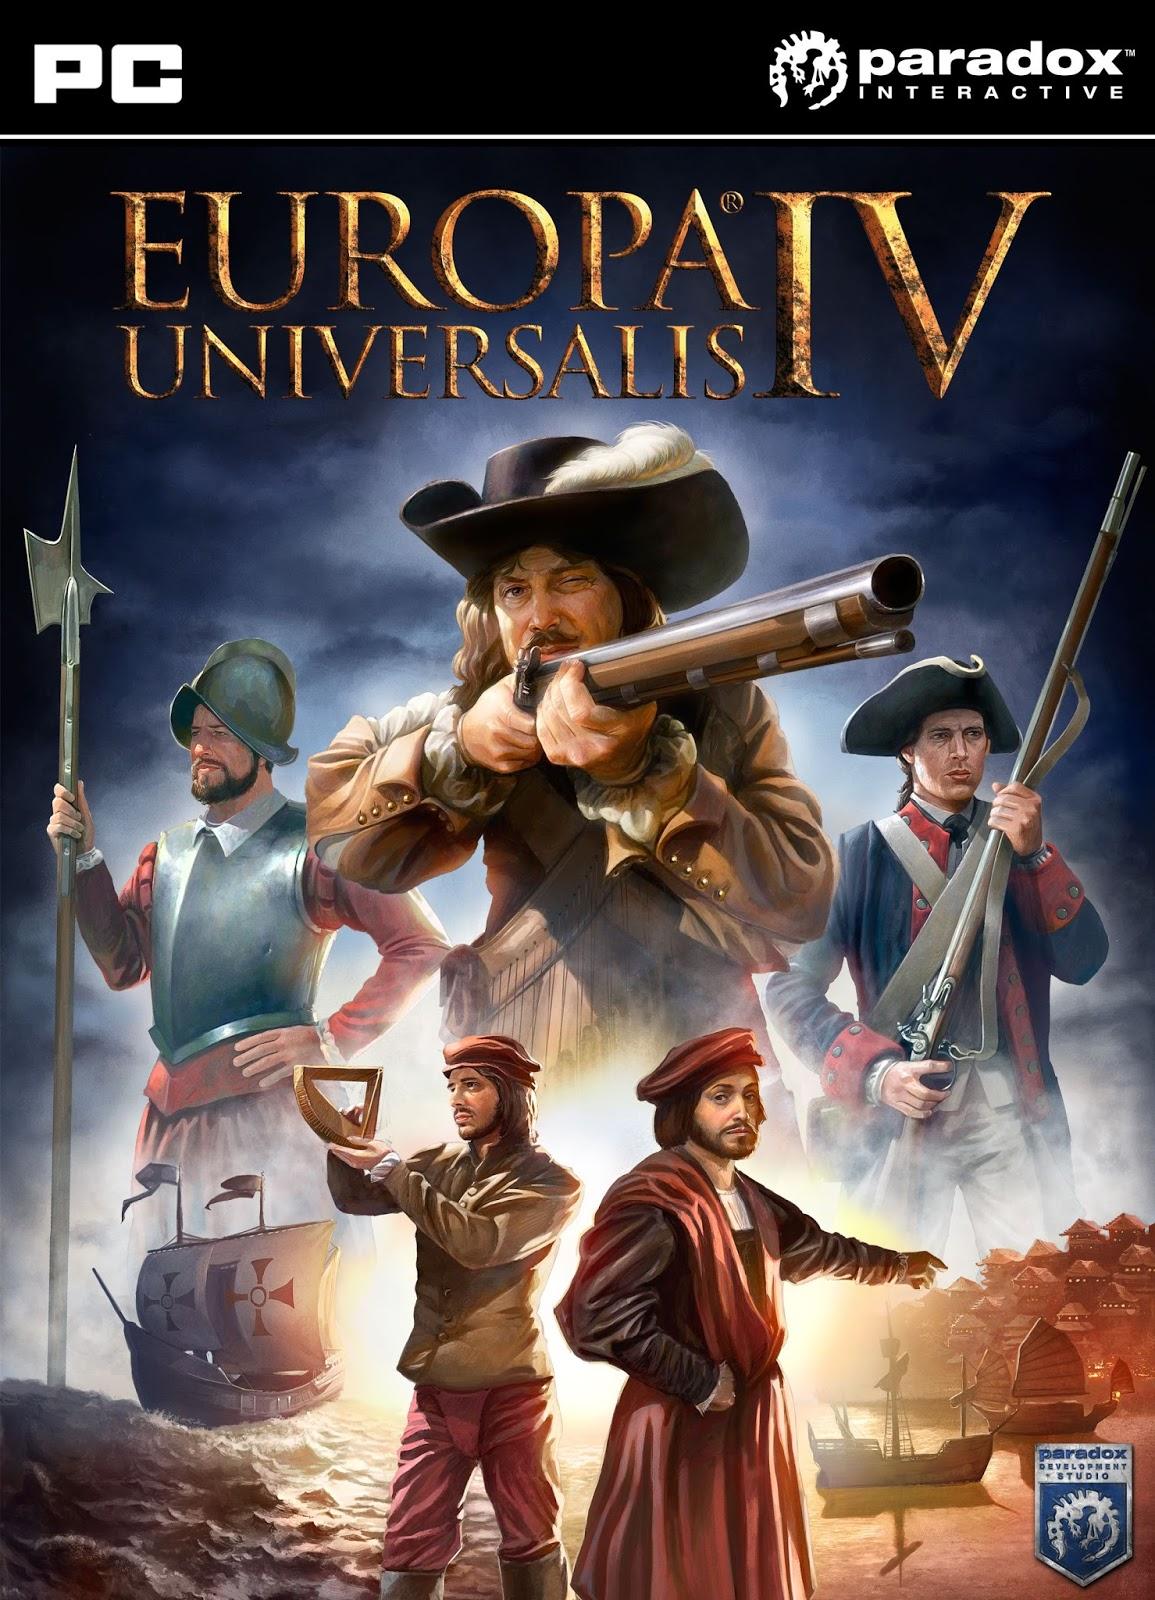 Europa Universalis 4 PC - Europa Universalis IV v1.15.0 (Inclu 47 DLC)